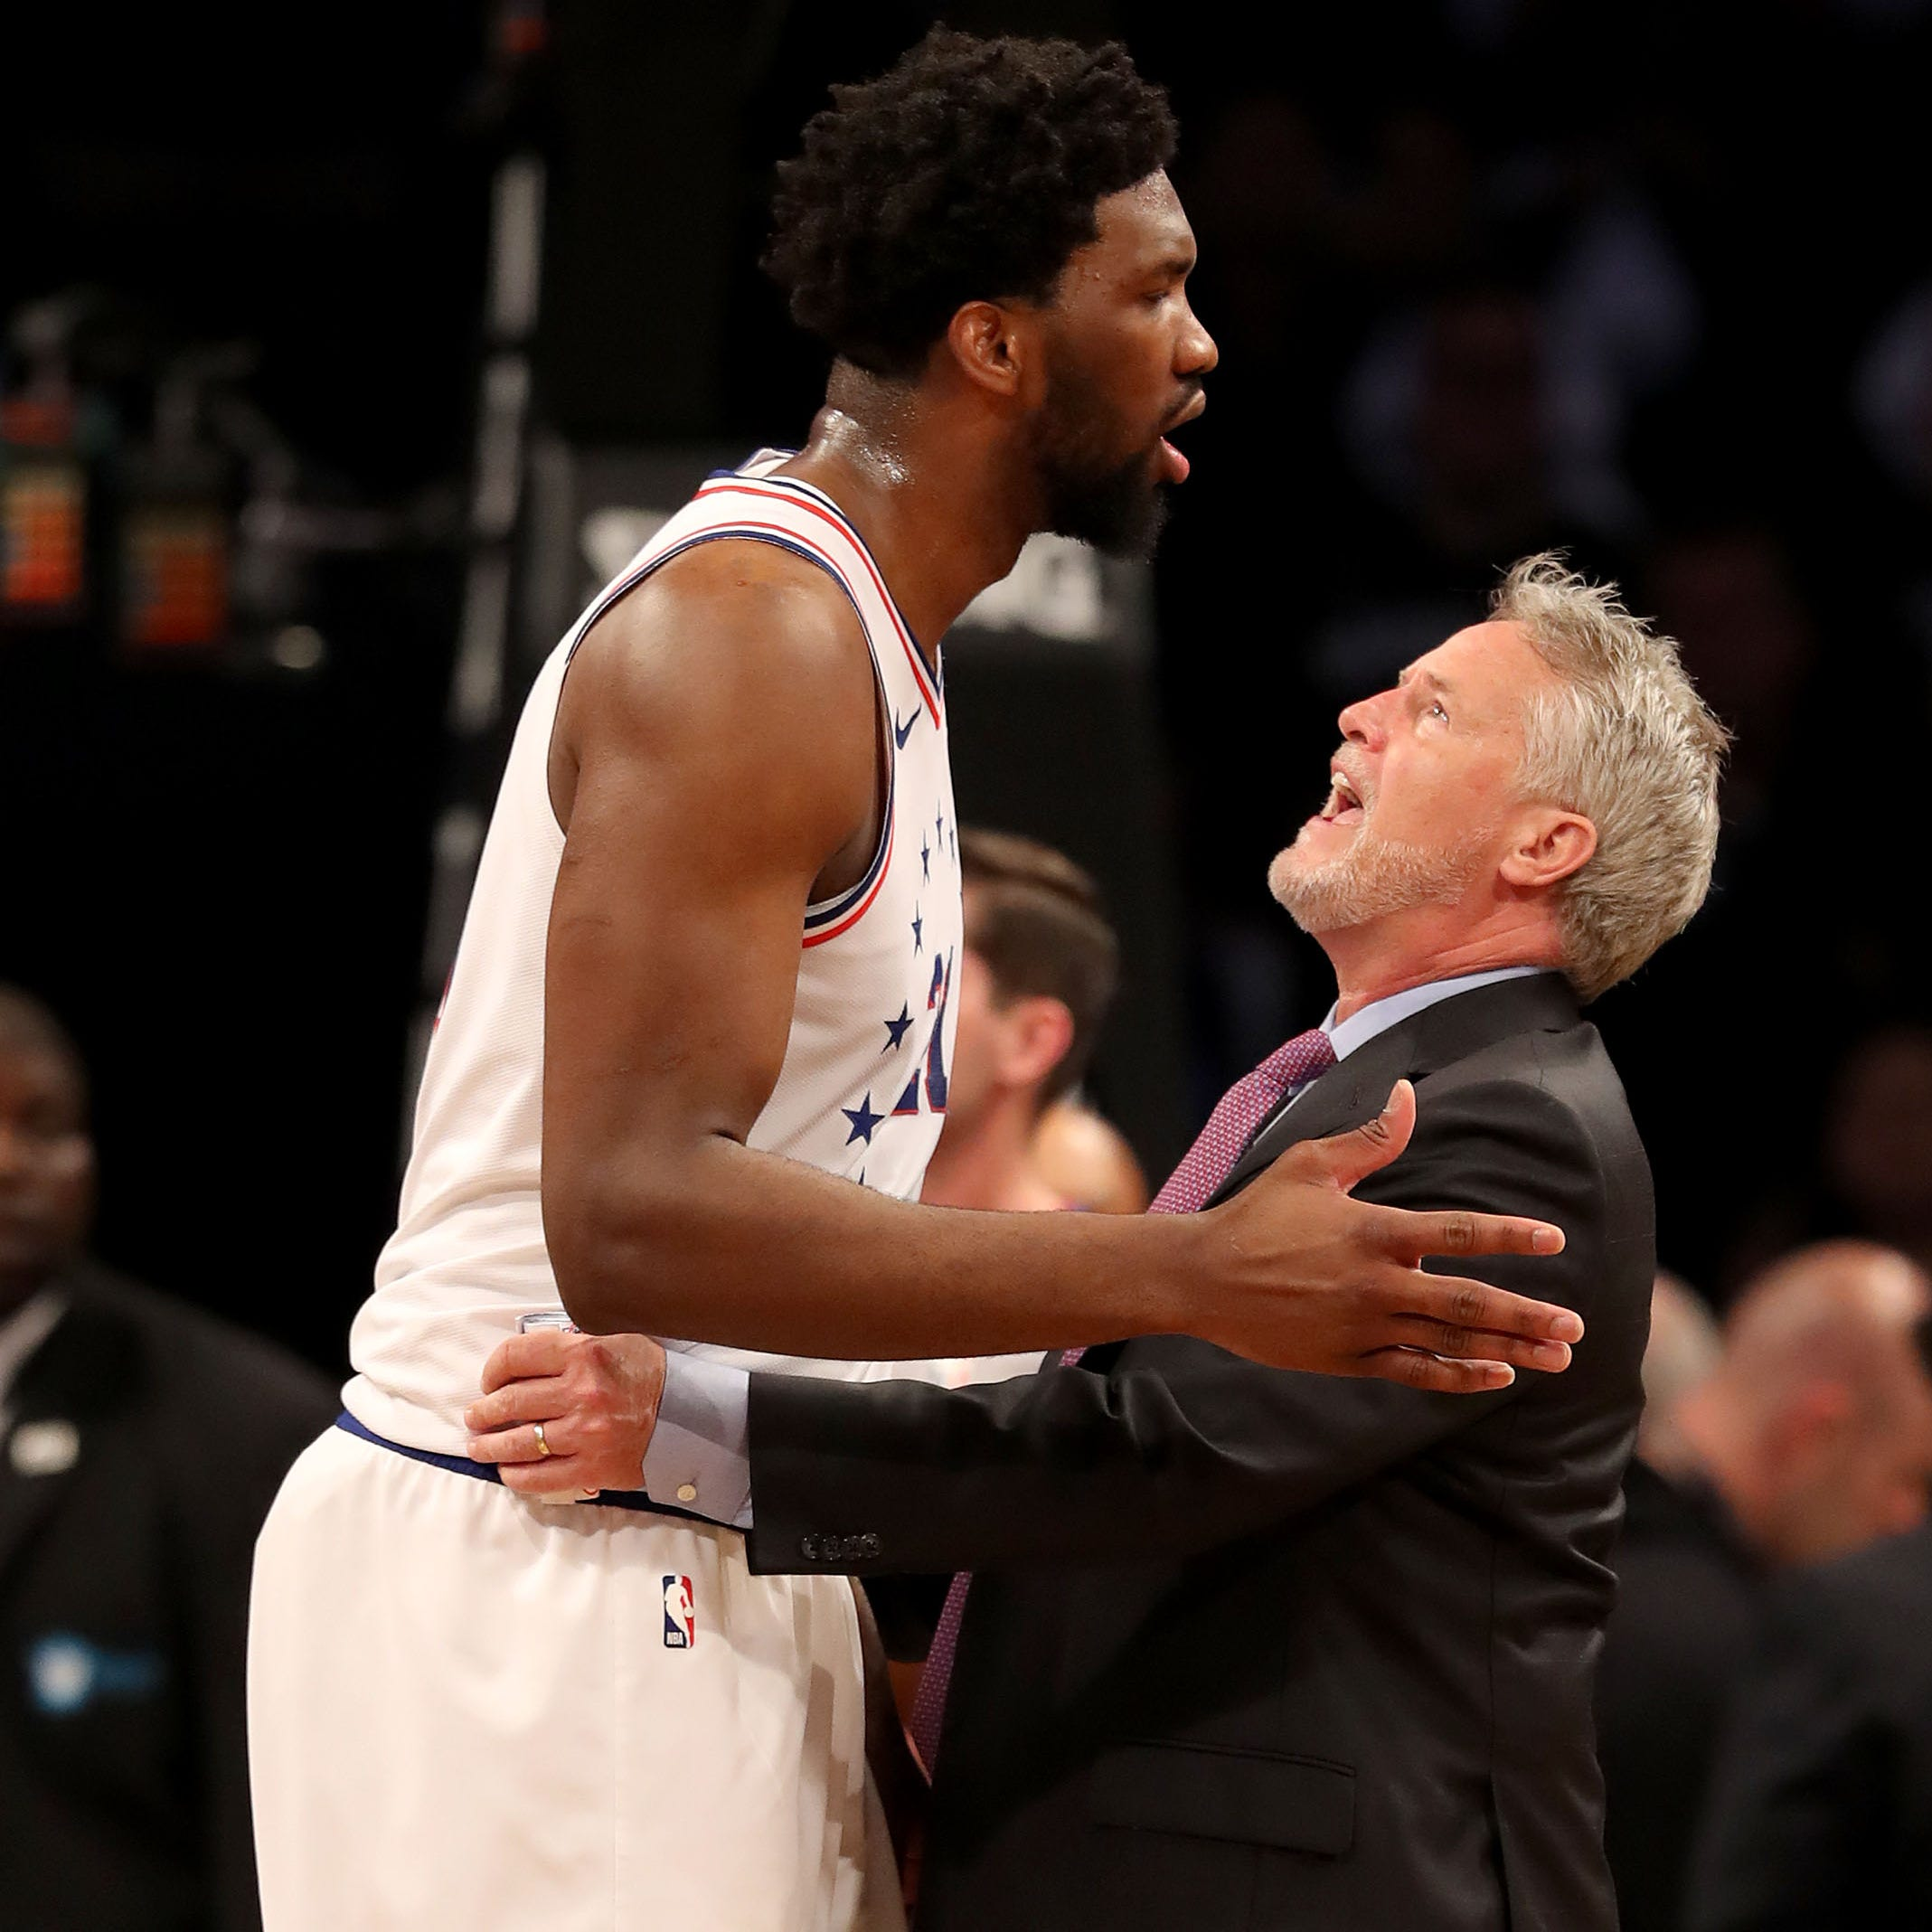 Joel Embiid defends 76ers coach Brett Brown amid 'BS' rumors